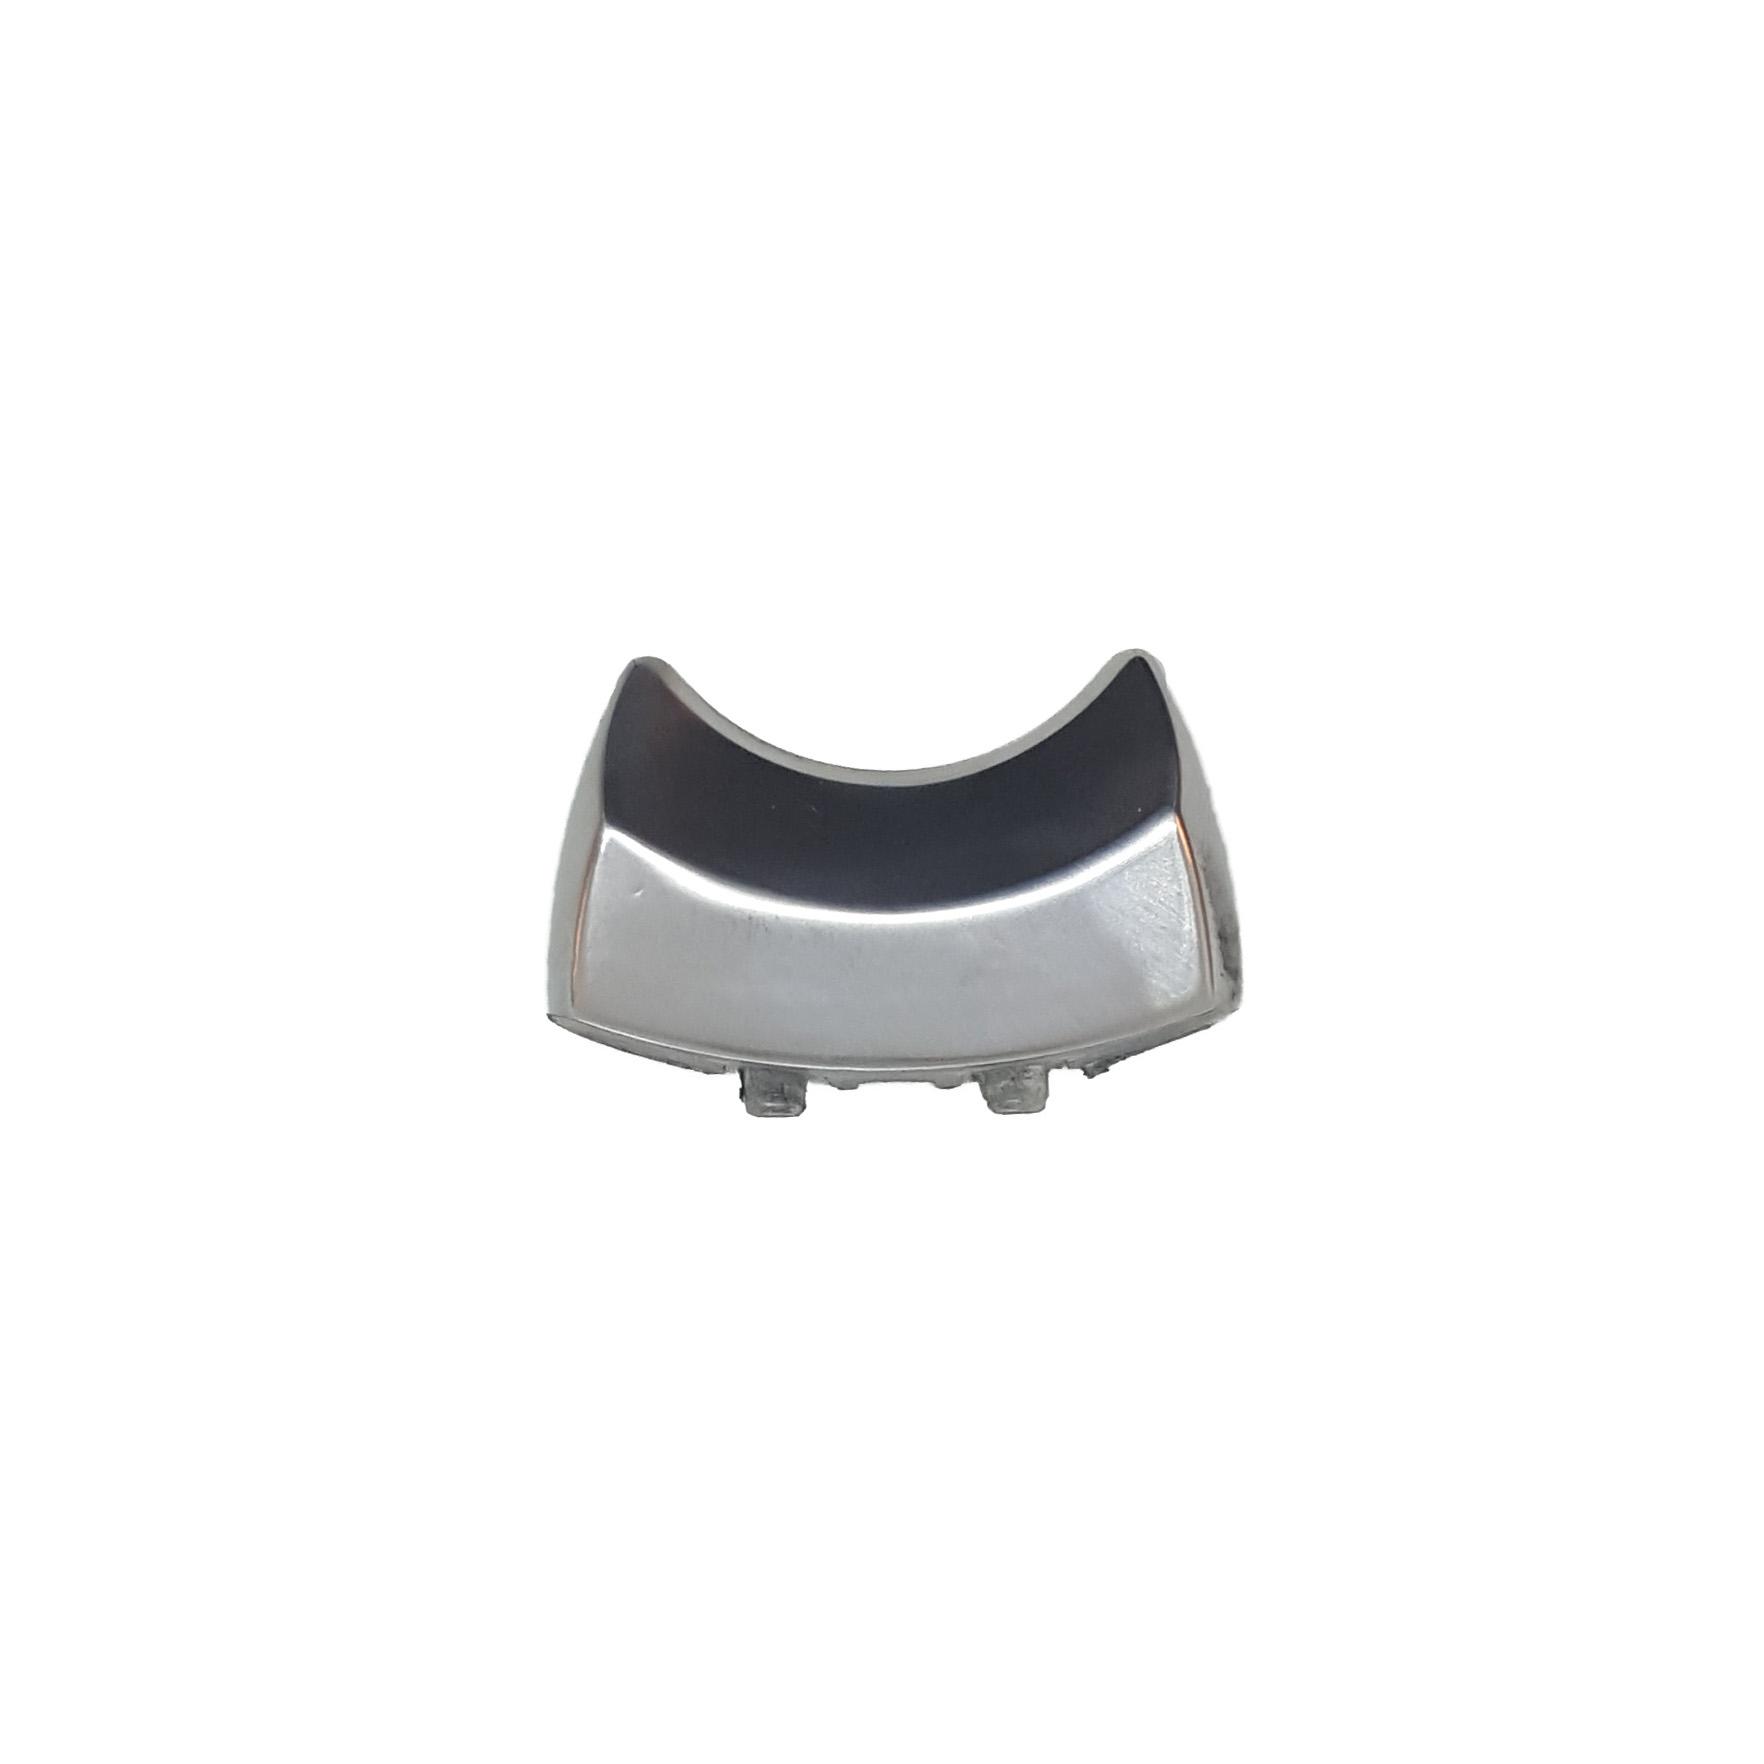 Fiorenzato Universal Polished Hook - 900000564